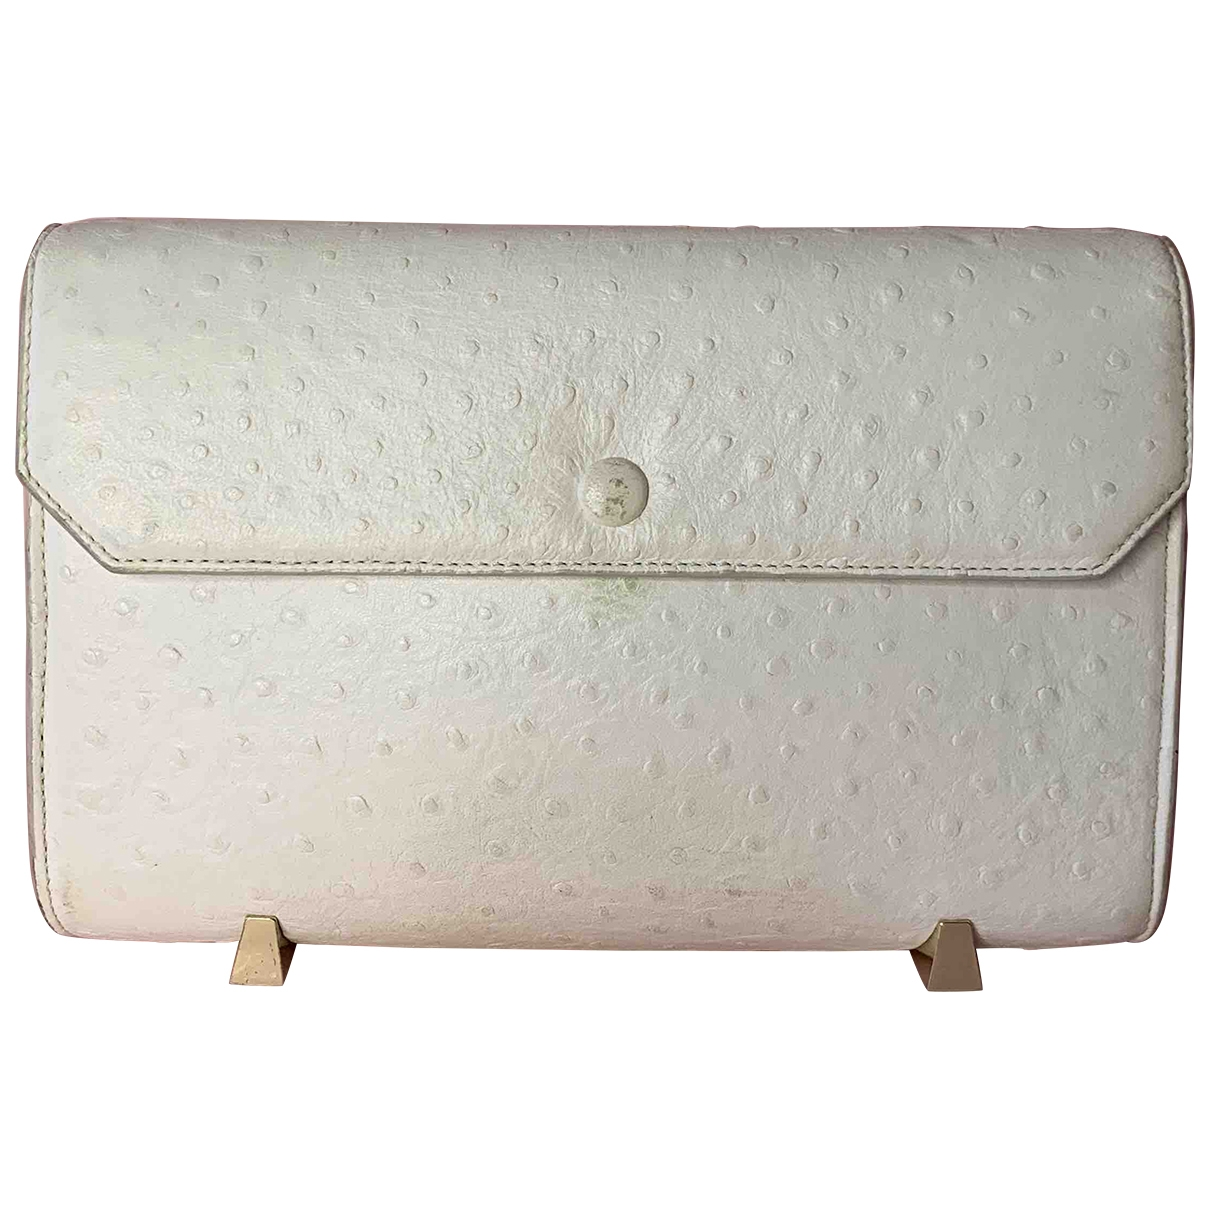 Alexander Wang \N White Ostrich Clutch bag for Women \N